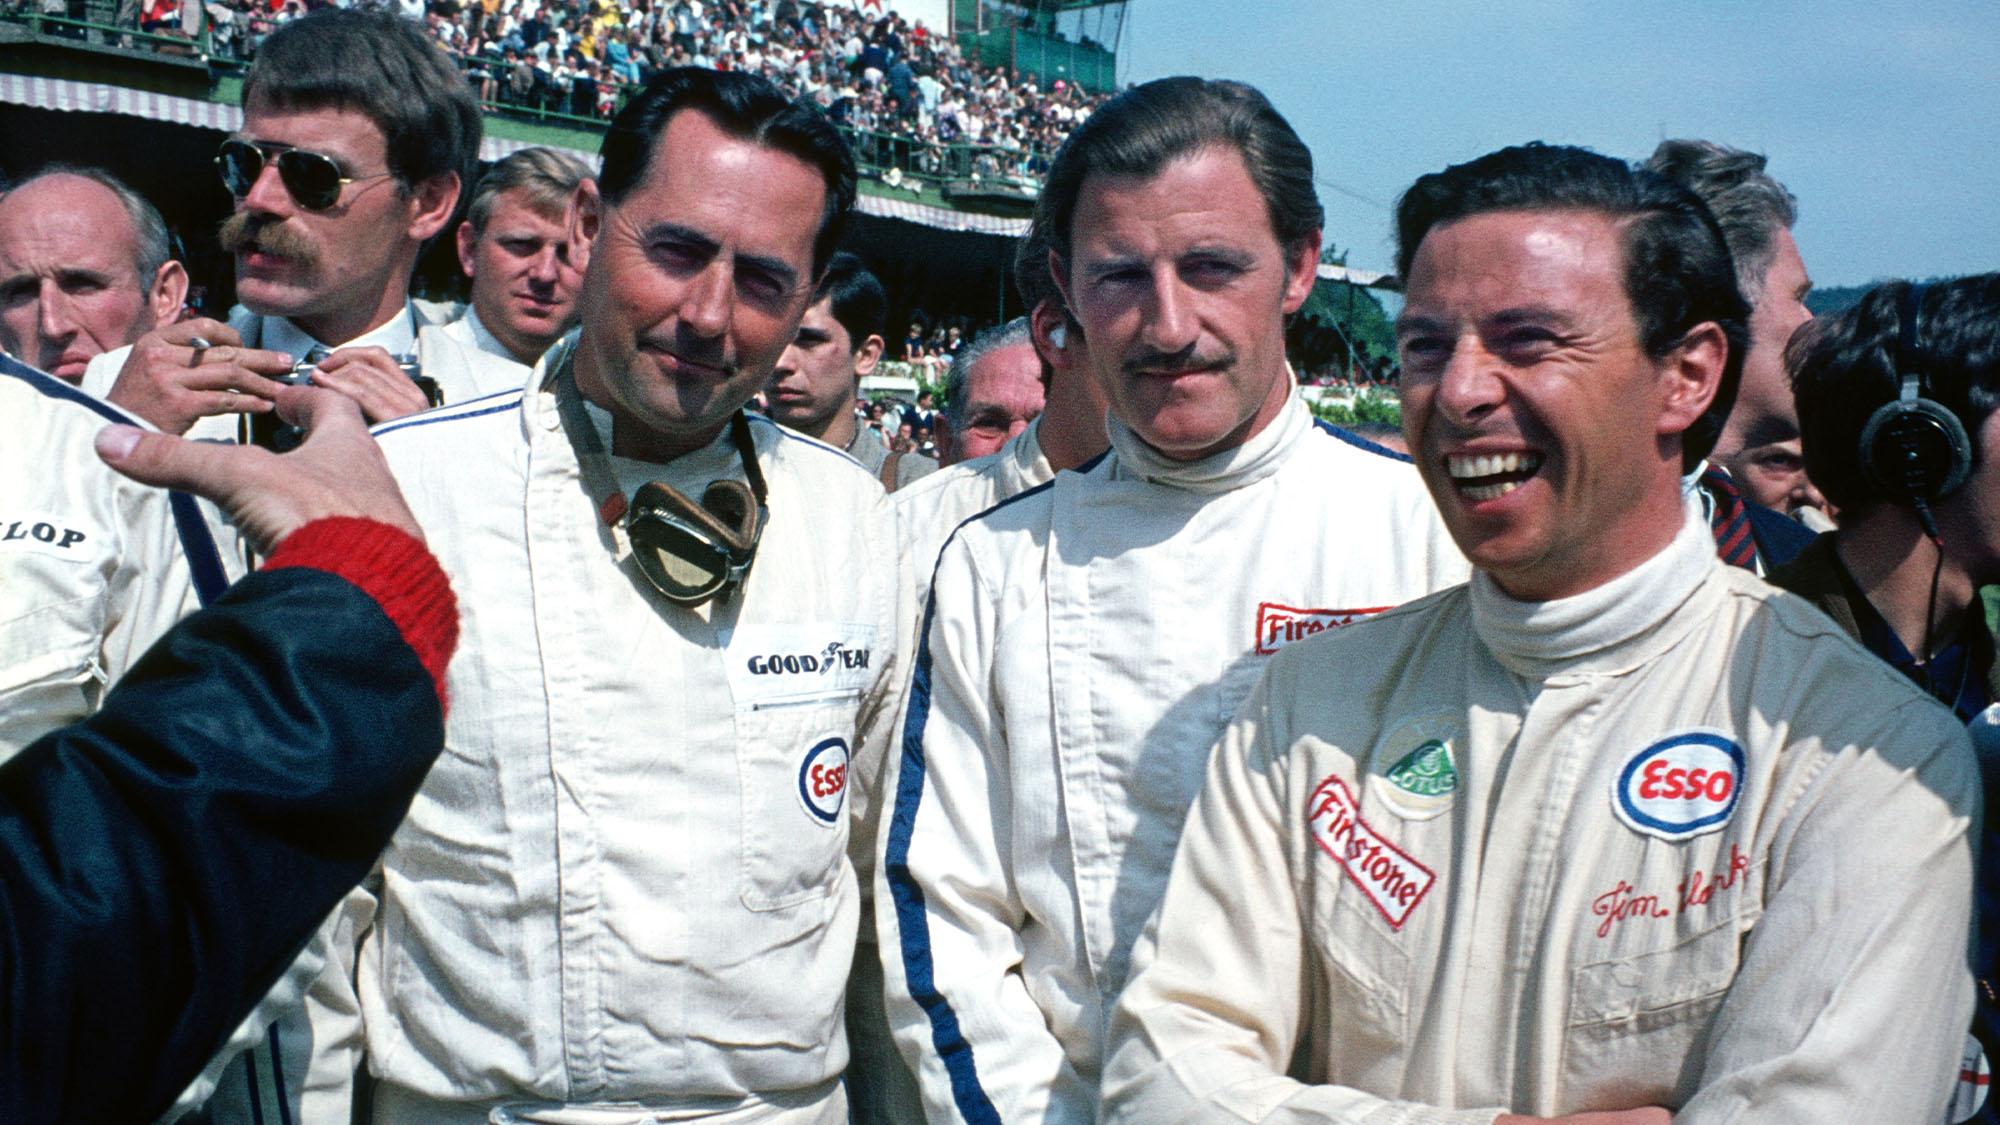 Jack Brabham (Brabham-Repco), Graham Hill () and Jim Clark (borh Lotus-Ford) before the 1967 Belgian Grand Prix in Spa-Francorchamps. Photo: Grand Prix Photo